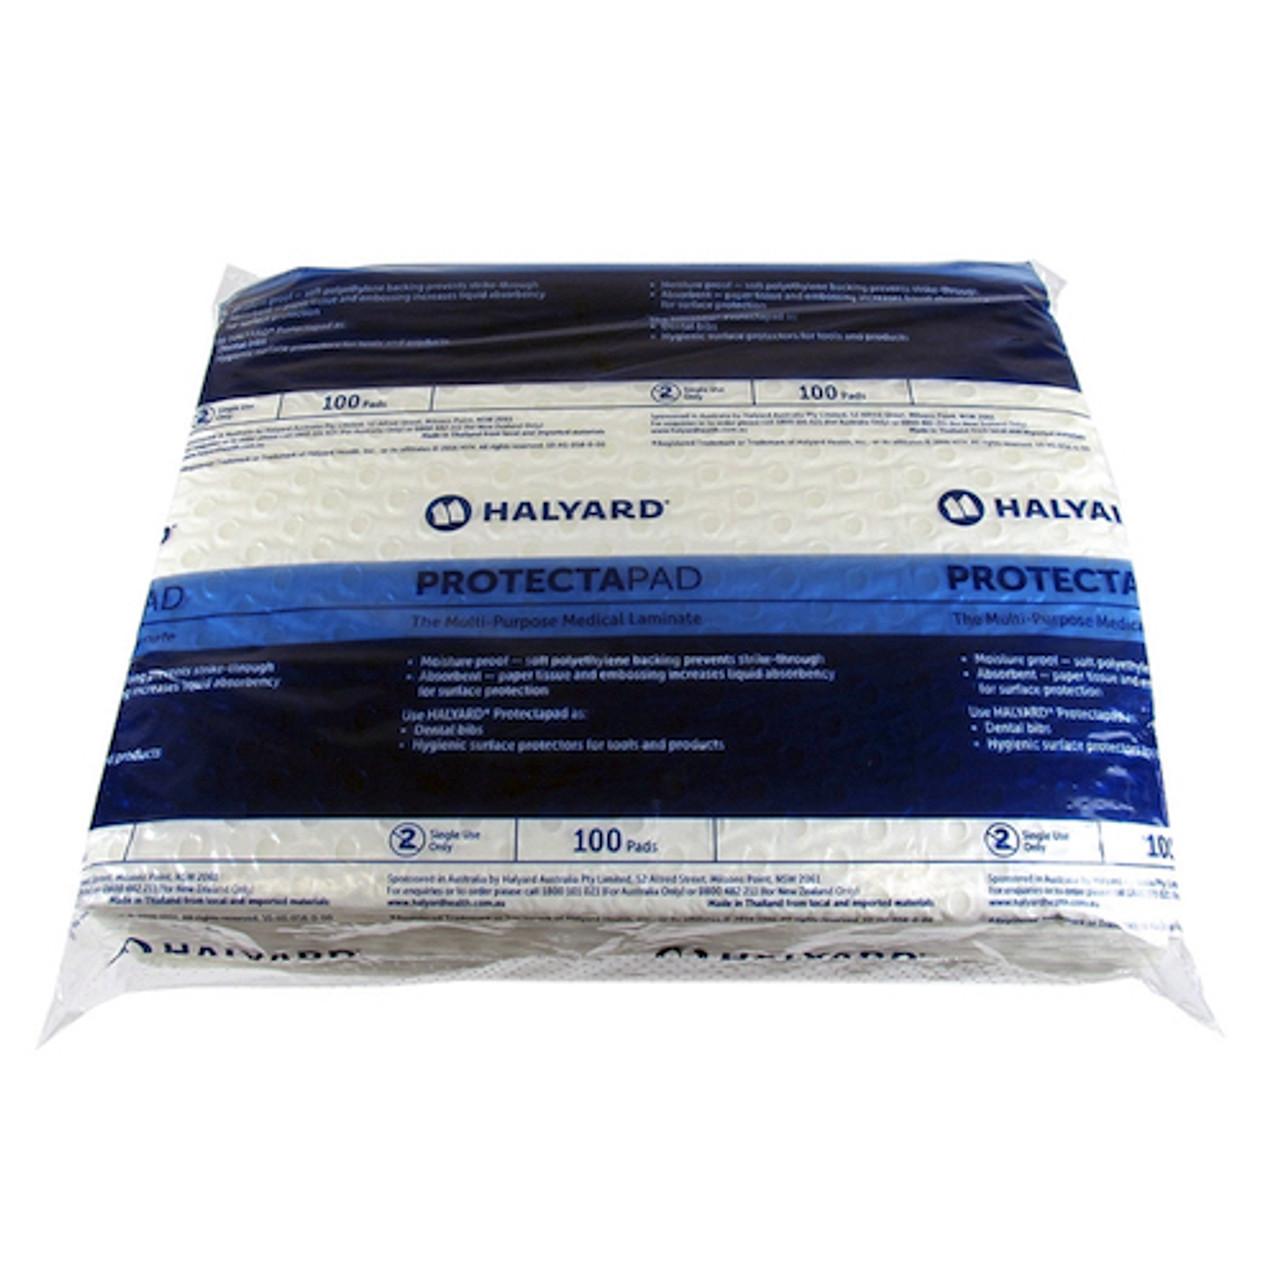 Halyard Protectapad Small 100 Pads 28.5cm x 21.5cm (HAL2706) Halyard Health